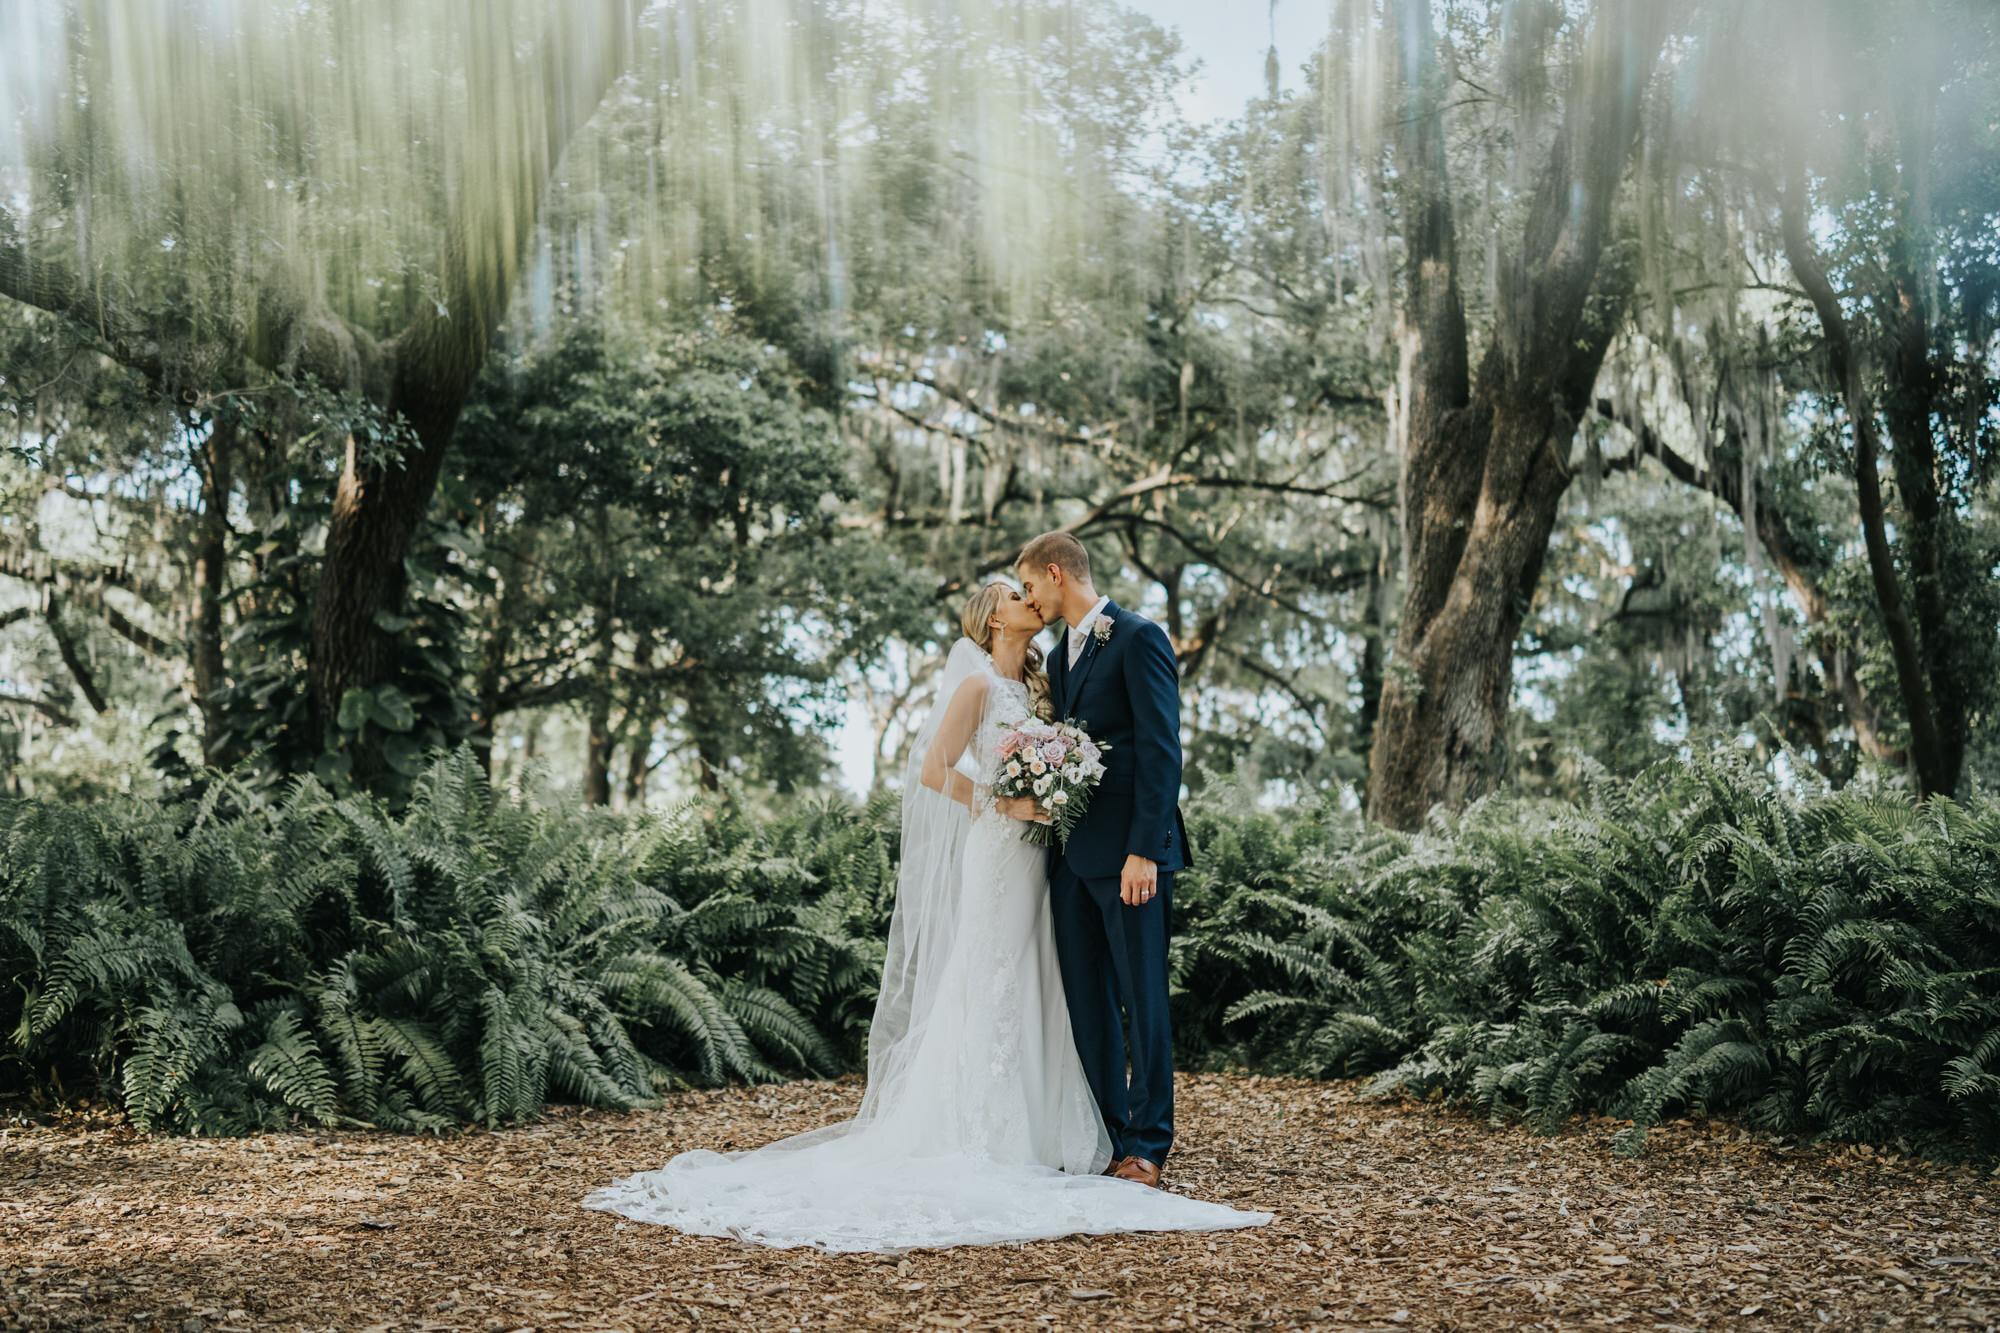 315Sean_Emily_Wedding_3-30-19.jpg